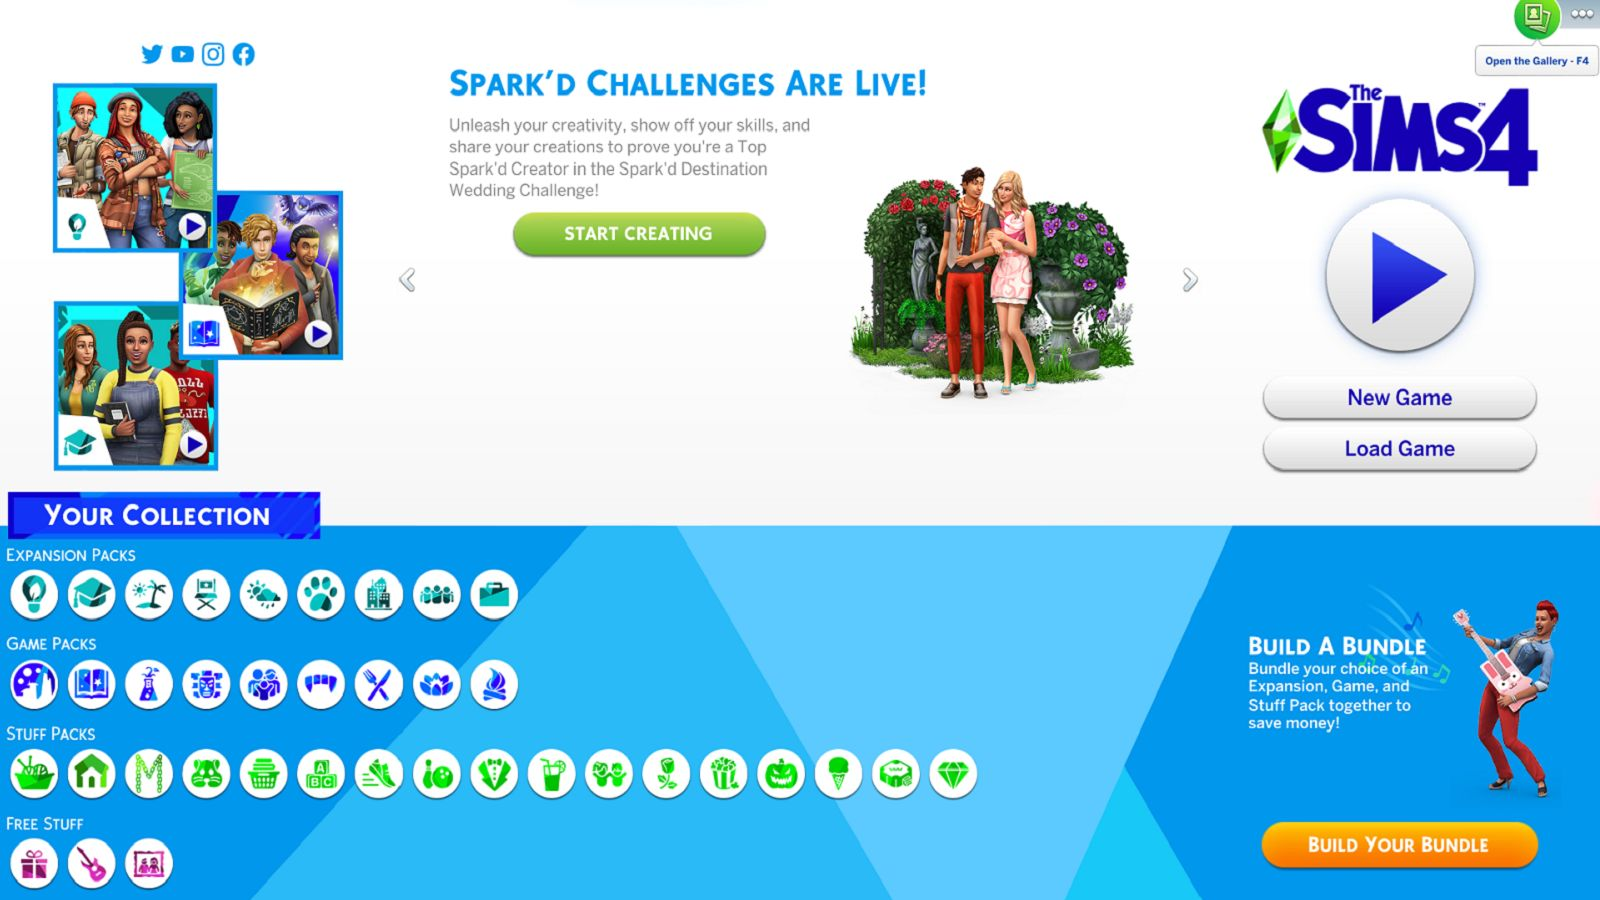 the-sims-sparkd-main-menu.jpg